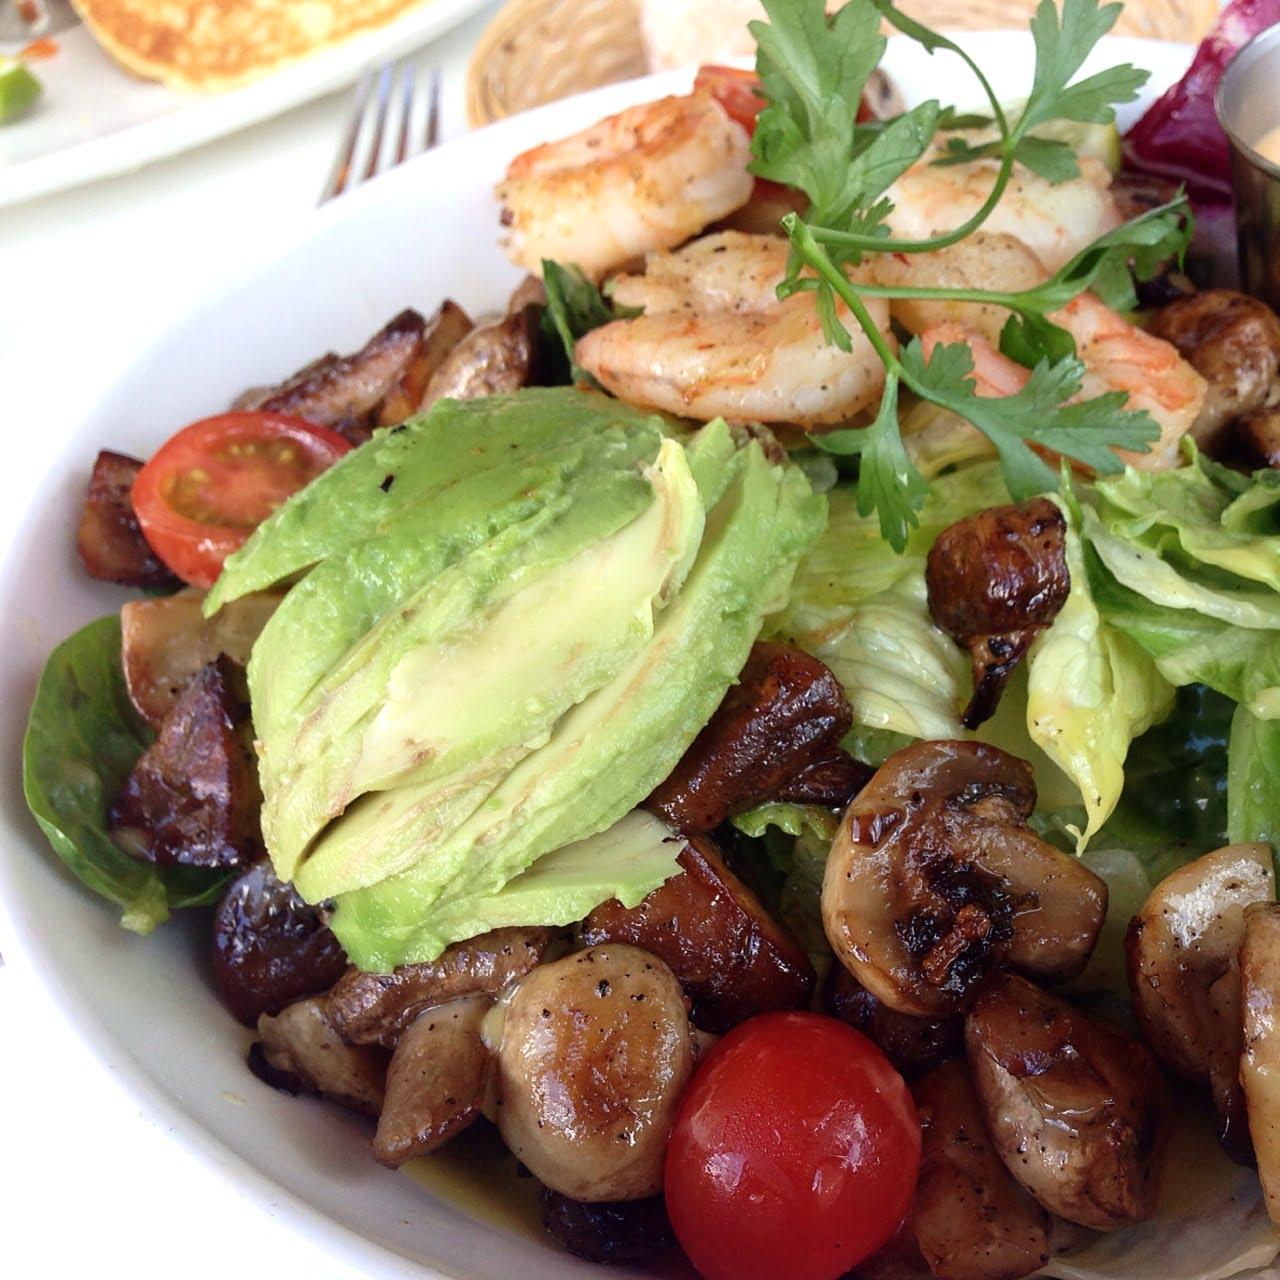 Salade fraicheur #2: Ma salade du «Paradis du fruit»